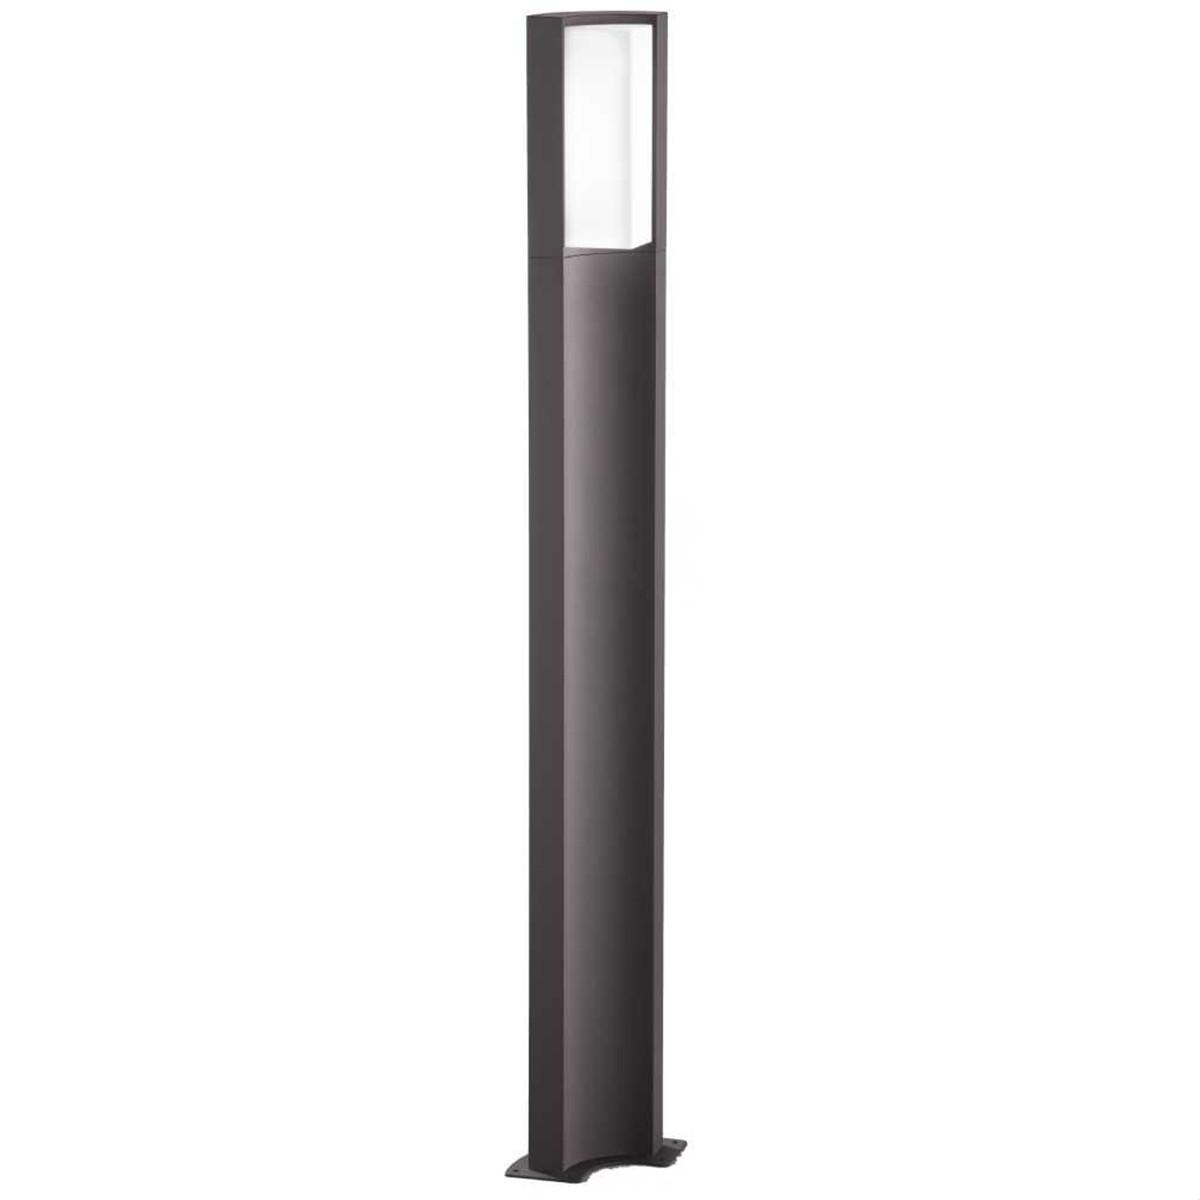 LED Tuinverlichting - Buitenlamp - Trion Soane XL - Staand - 8W - Mat Zwart - Aluminium